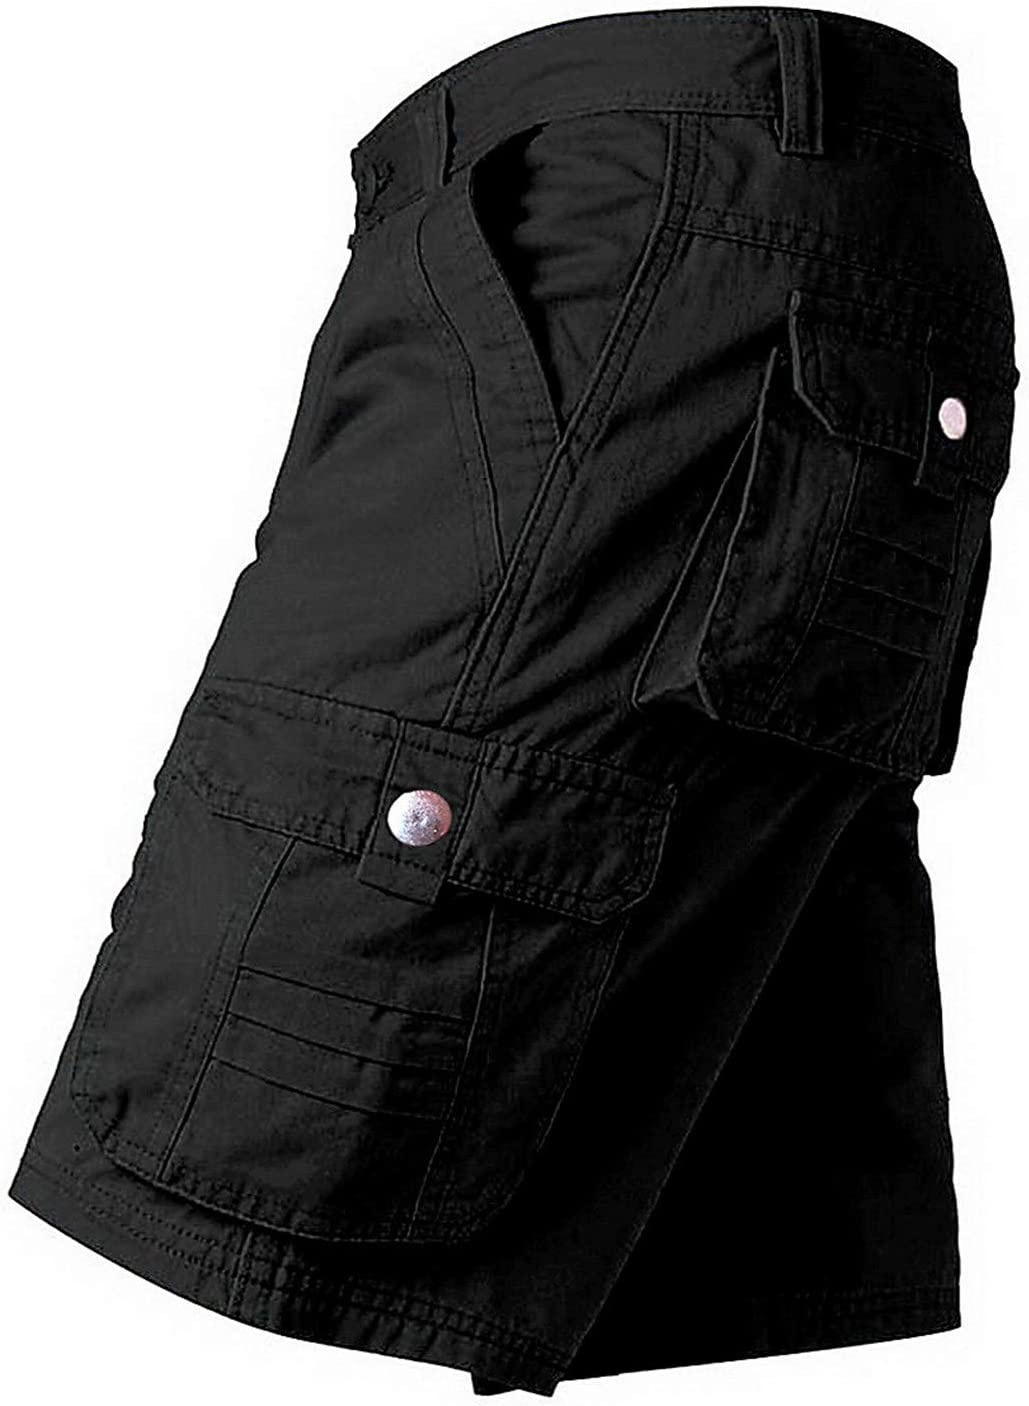 Yiqinyuan Men Shorts Work Shorts Trousers Military Fashion Short Pants Cargo Shorts with Multi-Pockets Pure Cotton Comfortable Black 30